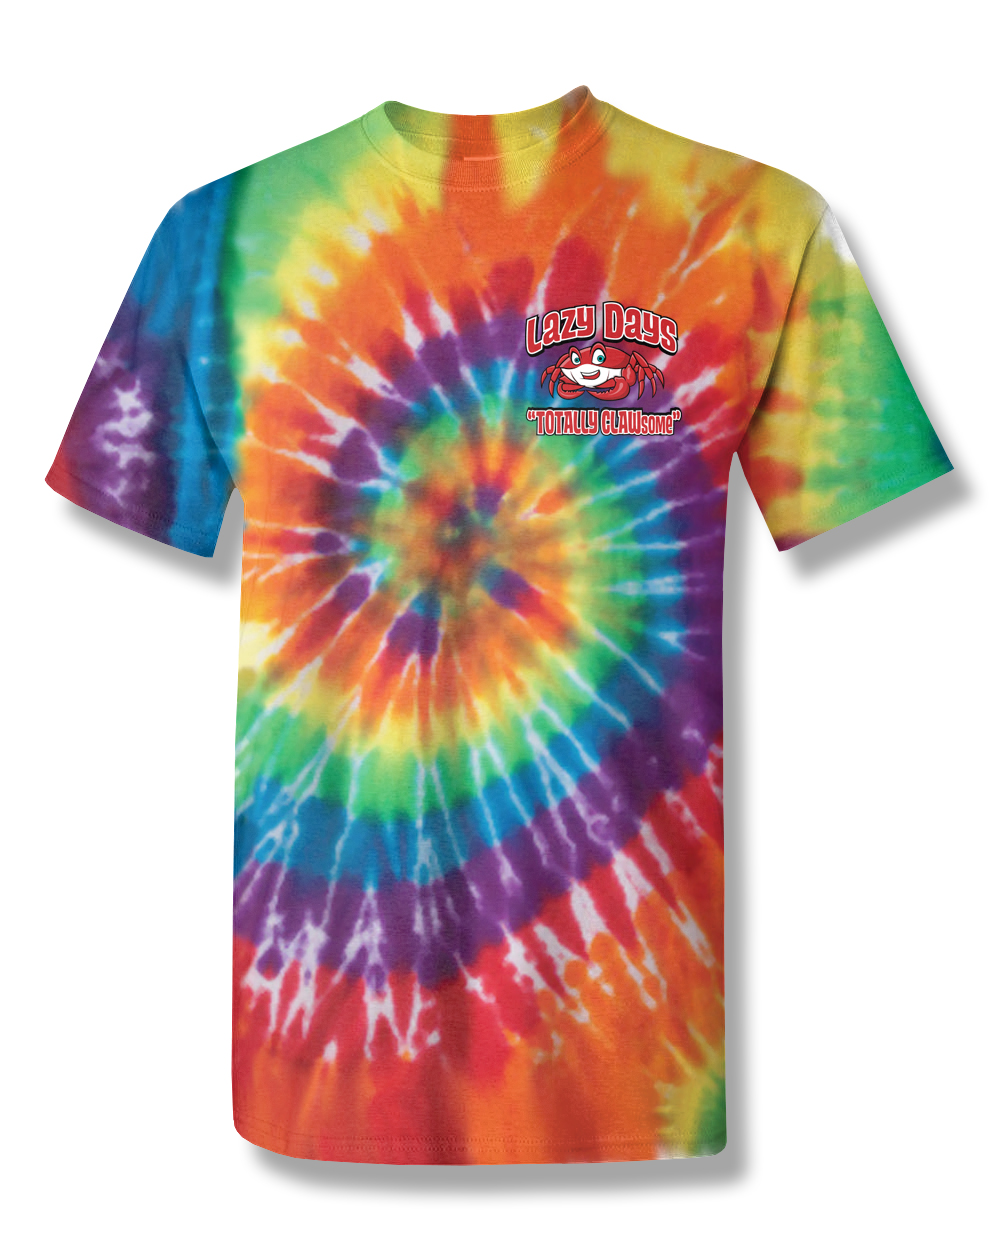 24070 tshirt front